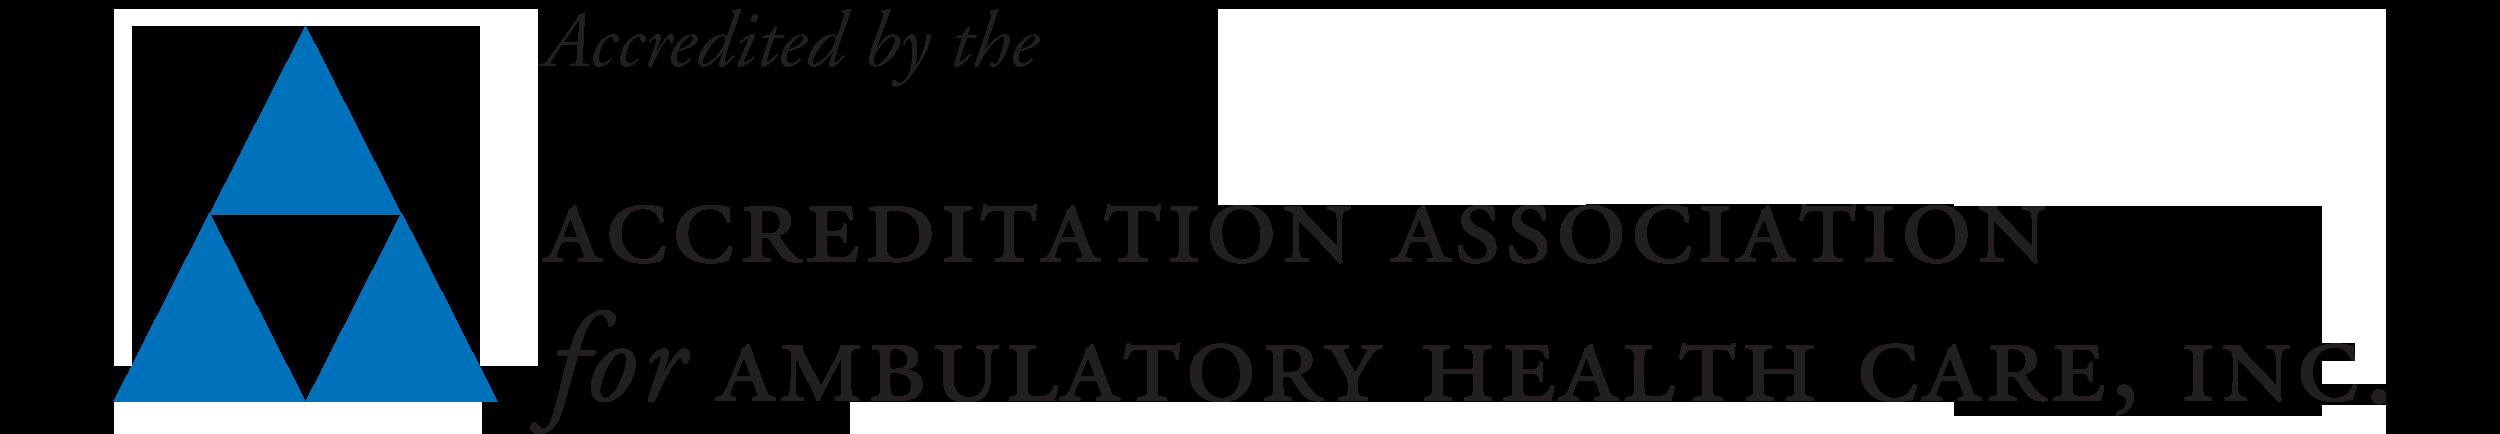 aaahc-accreditation